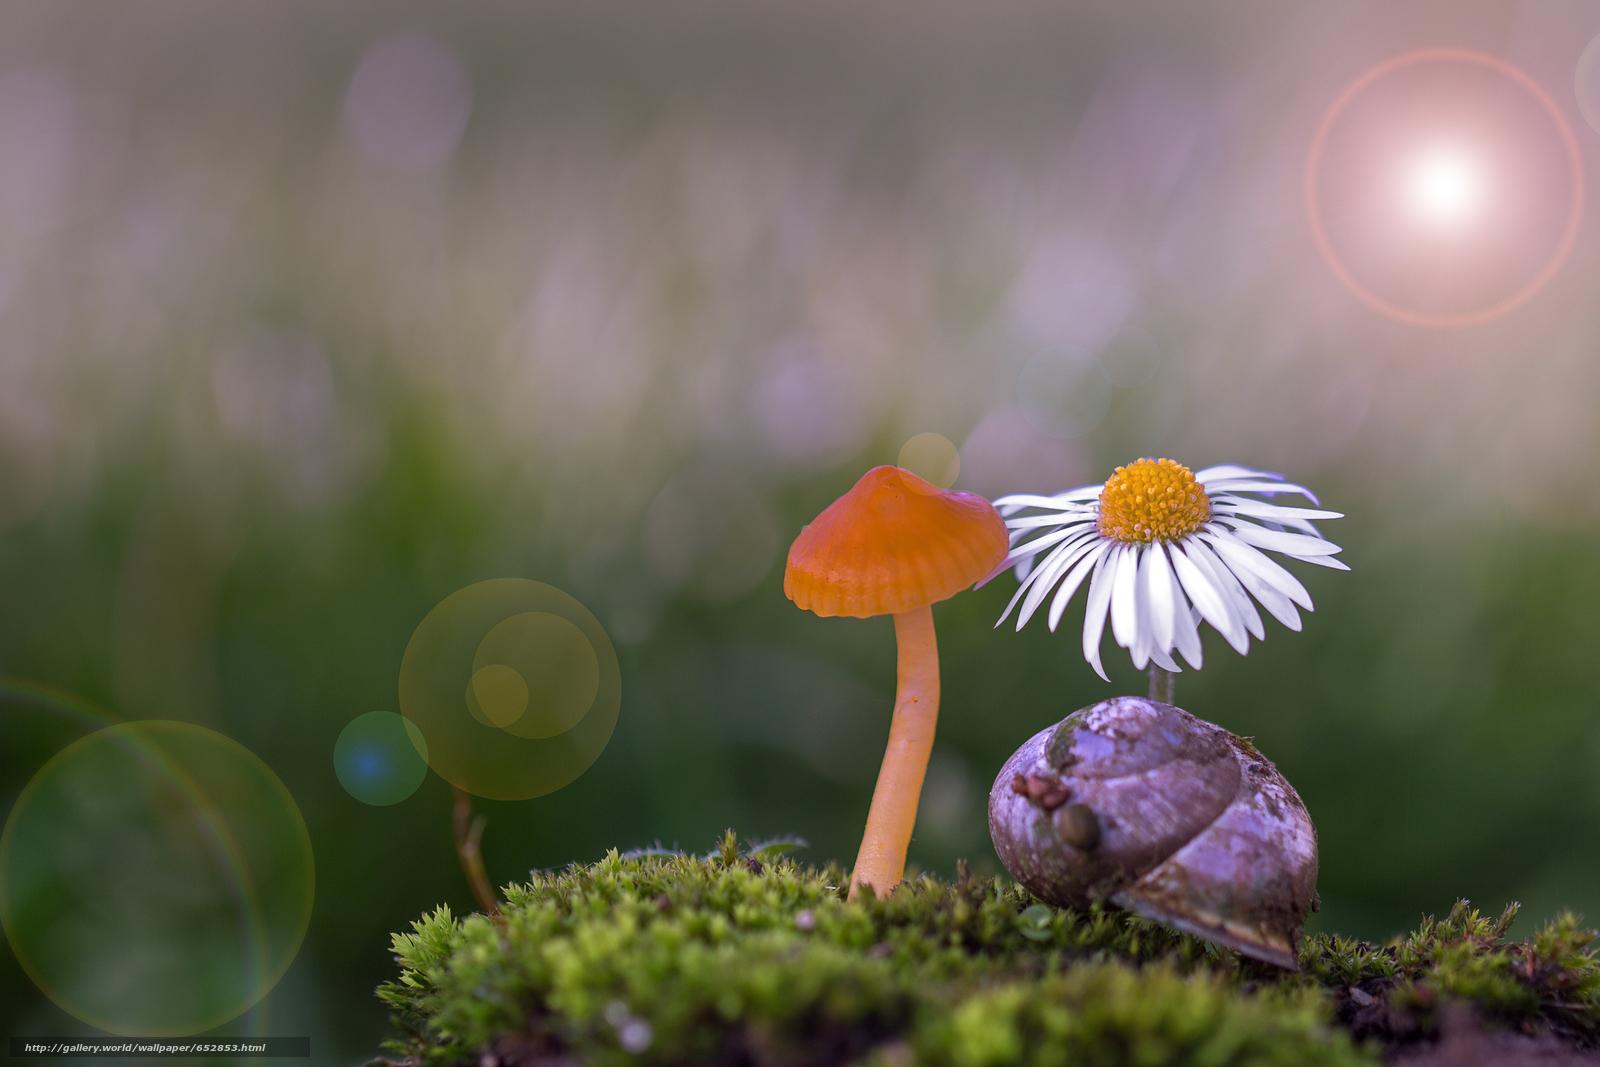 Download wallpaper mushrooms,  mushroom,  Macro free desktop wallpaper in the resolution 5184x3456 — picture №652853